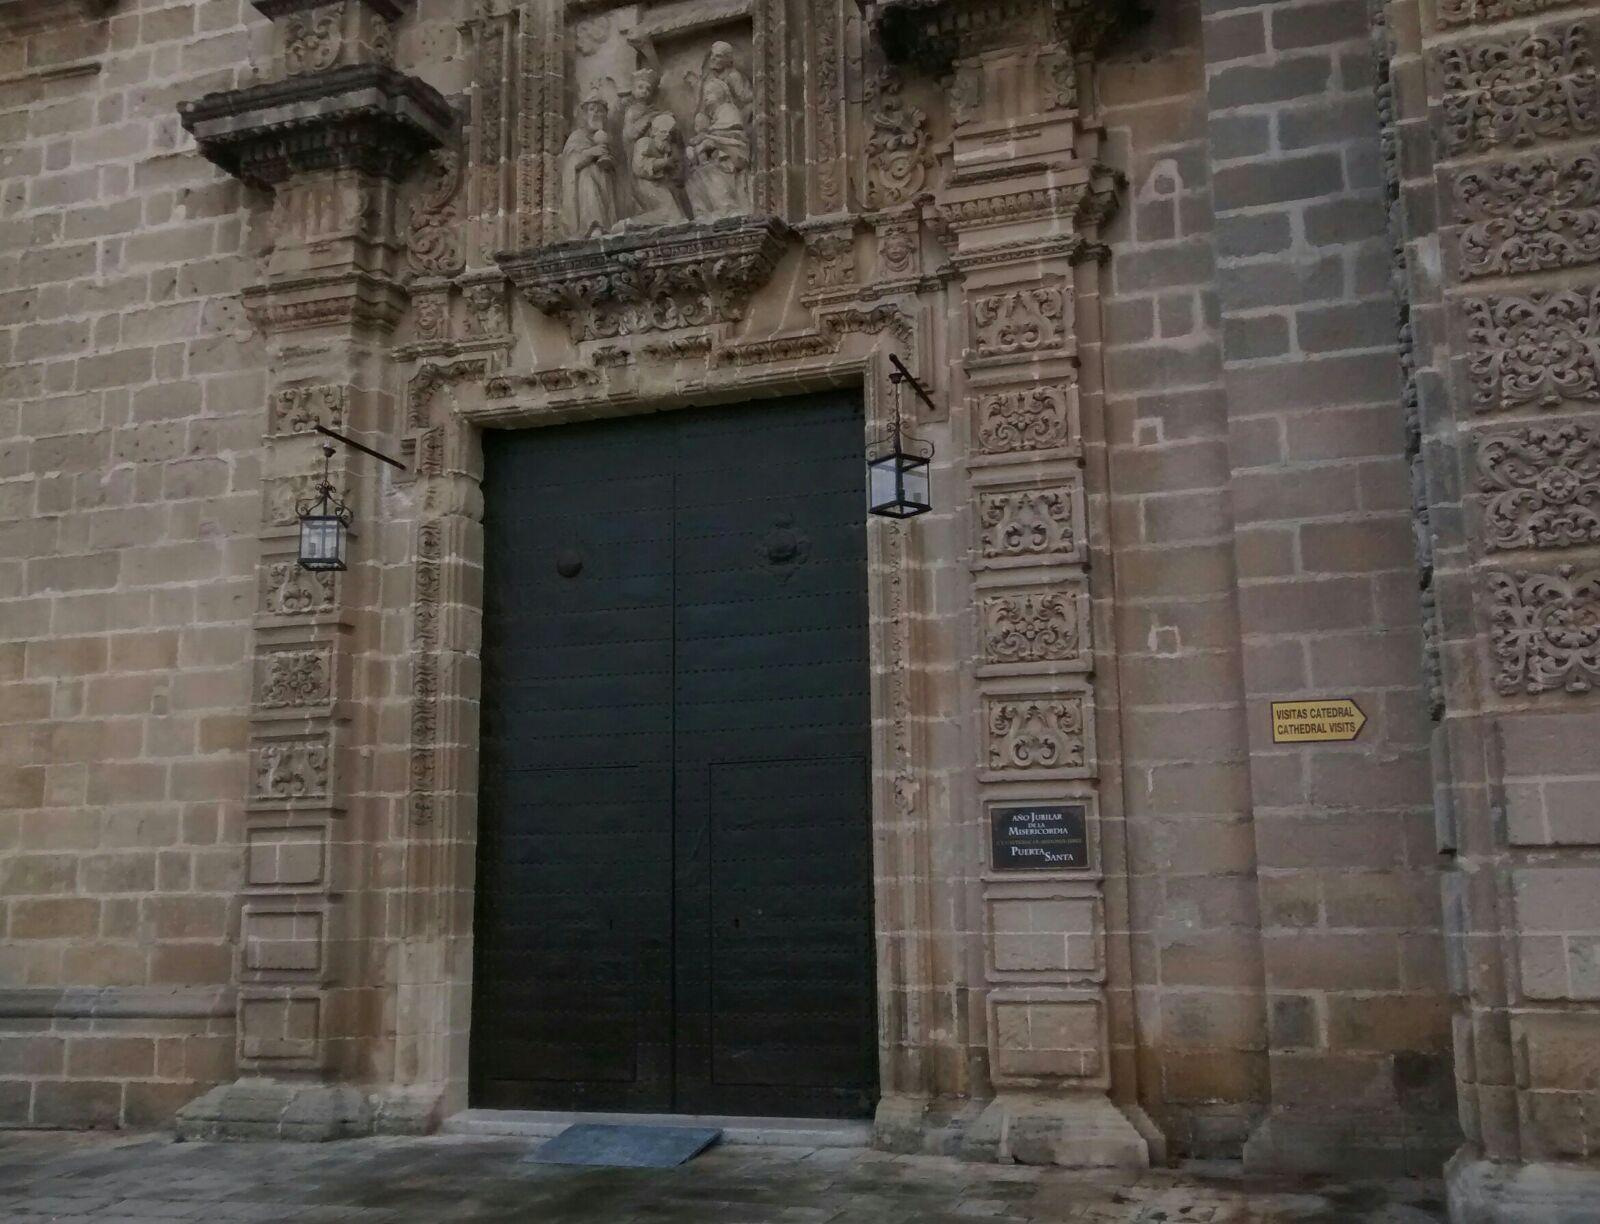 Puerta Santa de la Misericordia, Catedral de Jerez